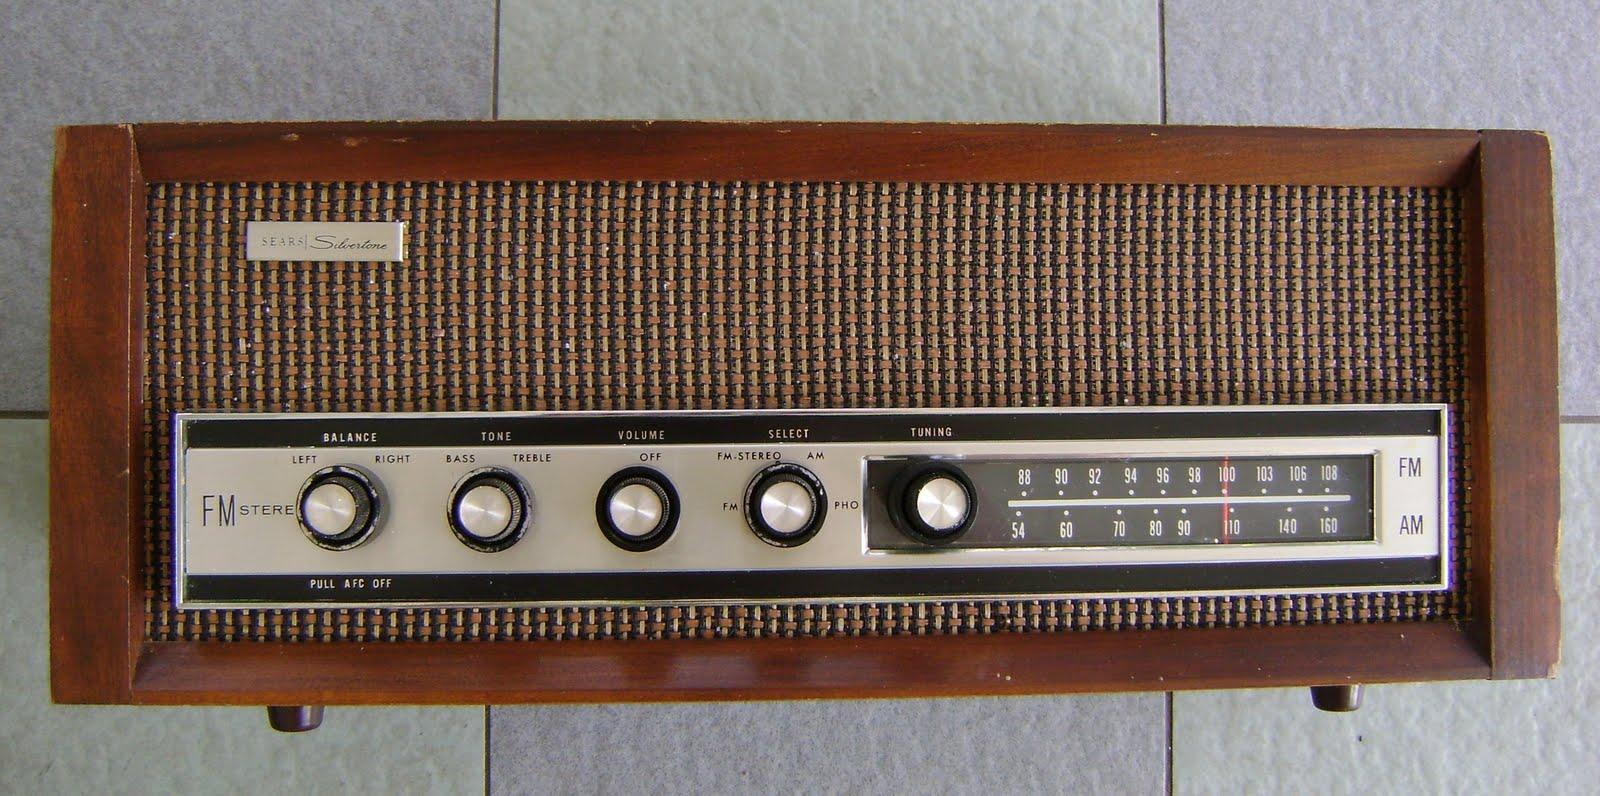 lurke forex converter yahoo 7